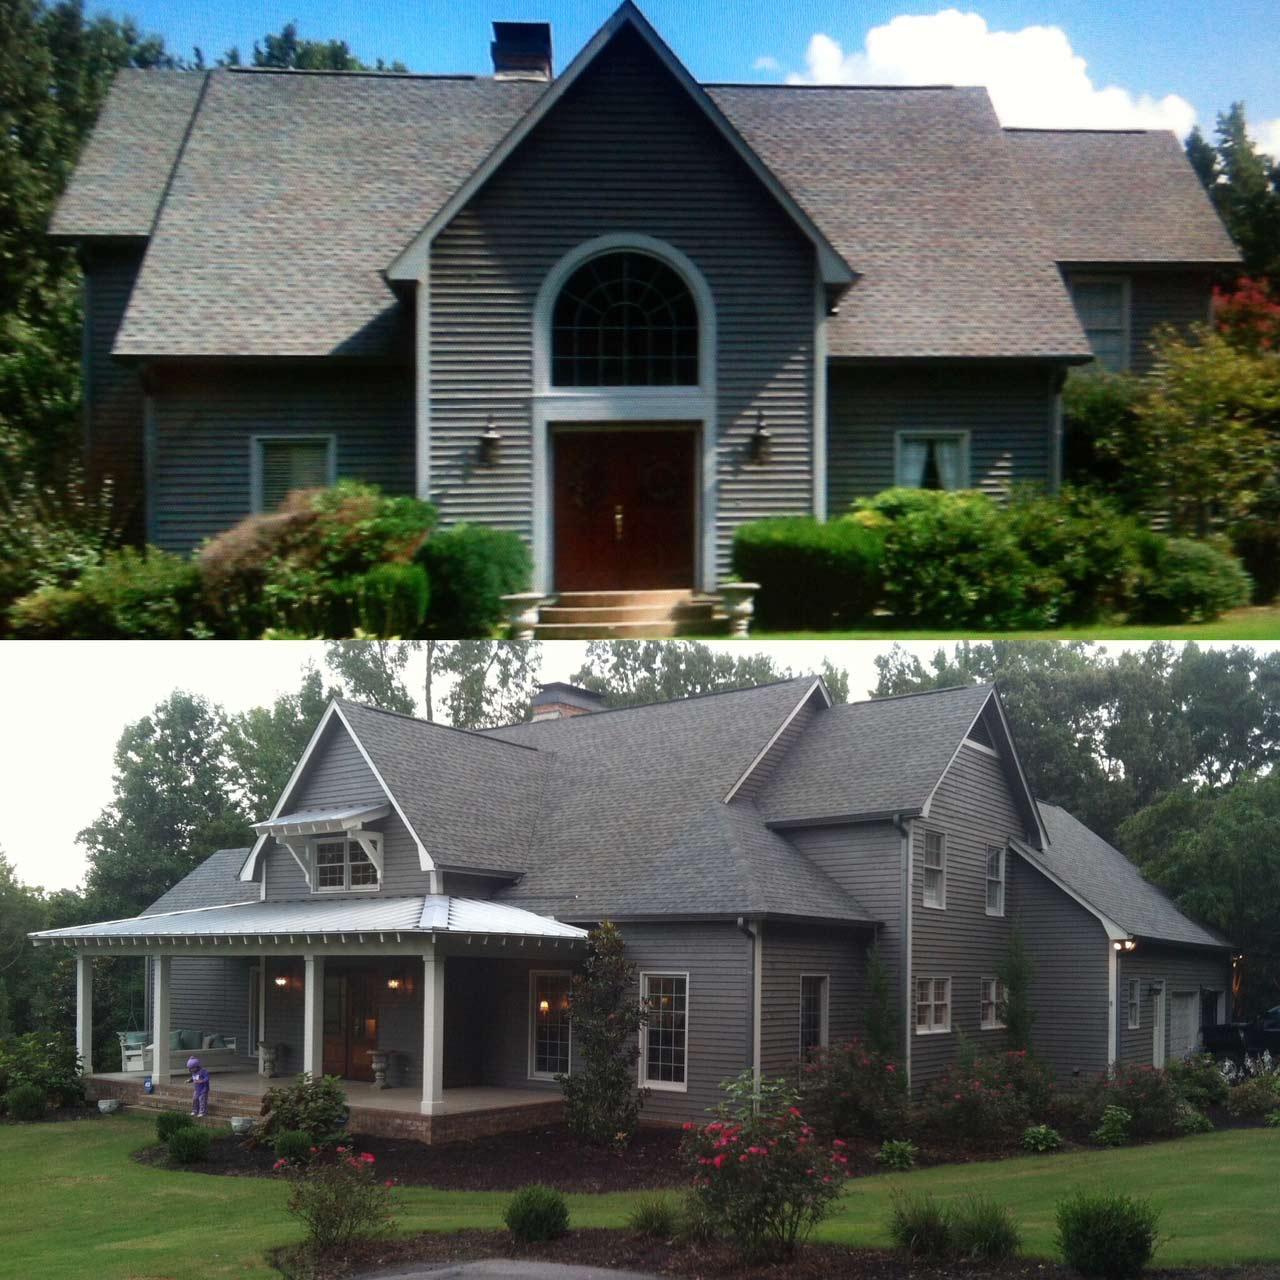 Home - Beautiful Black House in Decatur, AL